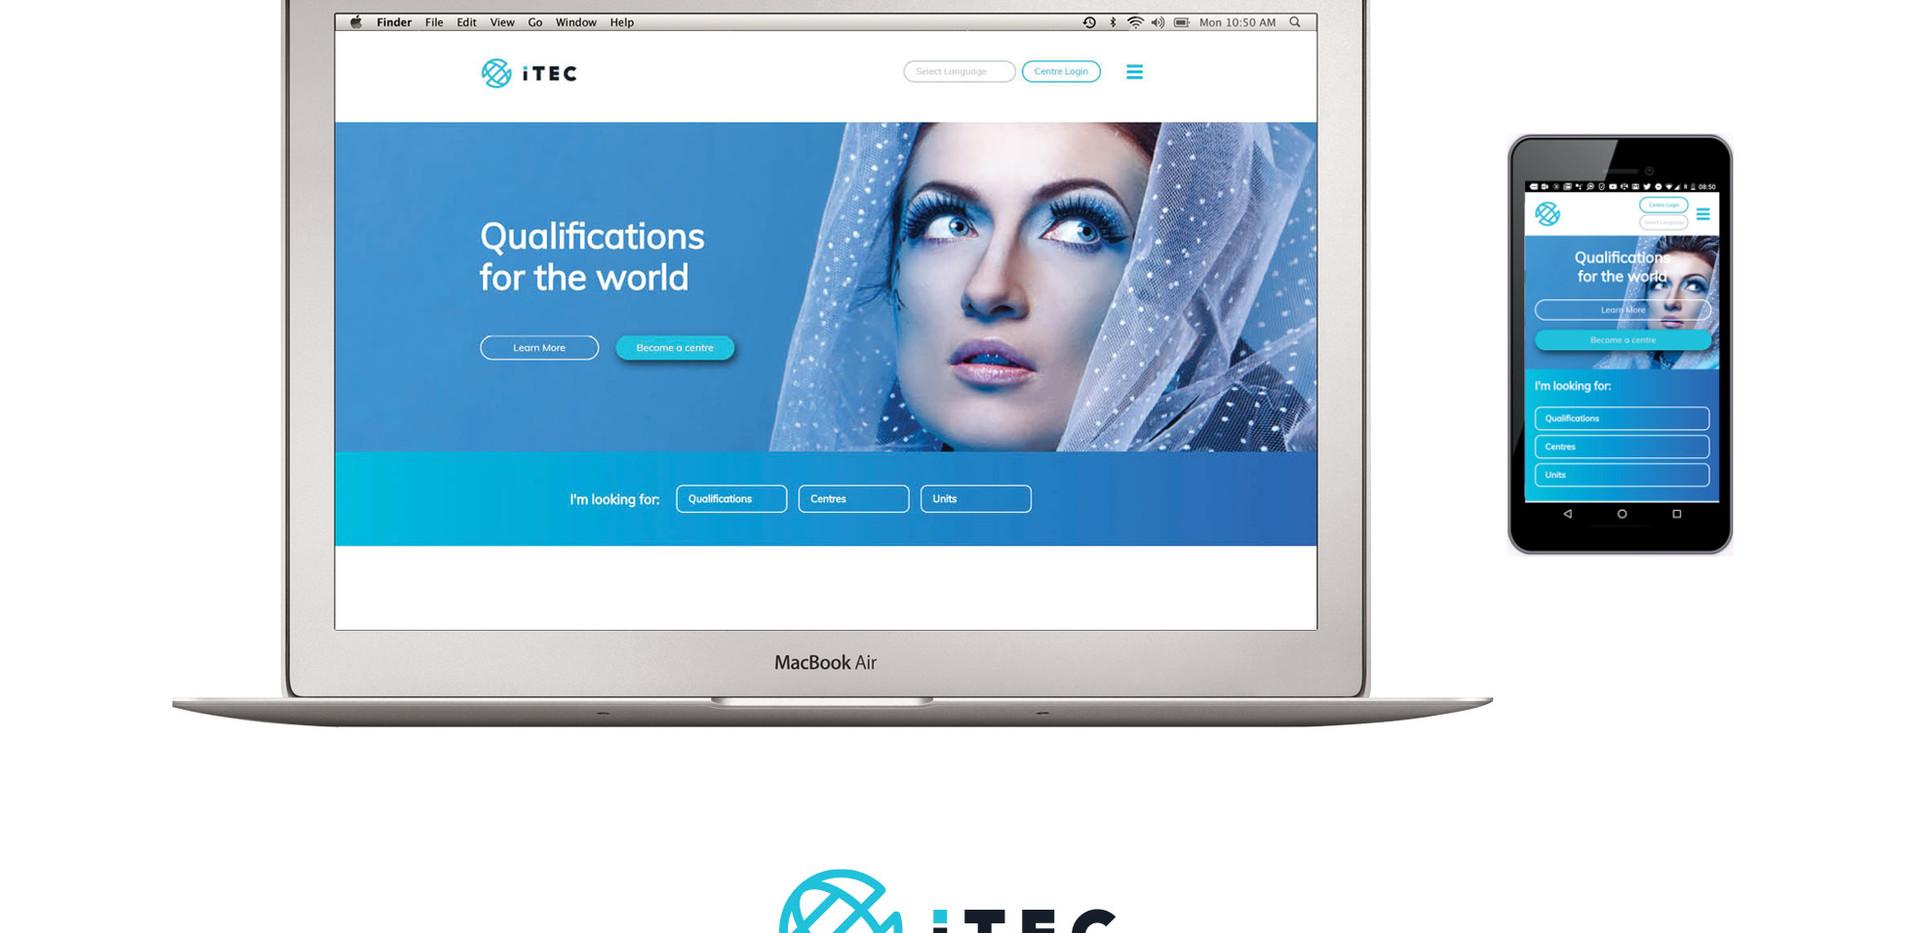 Itec website